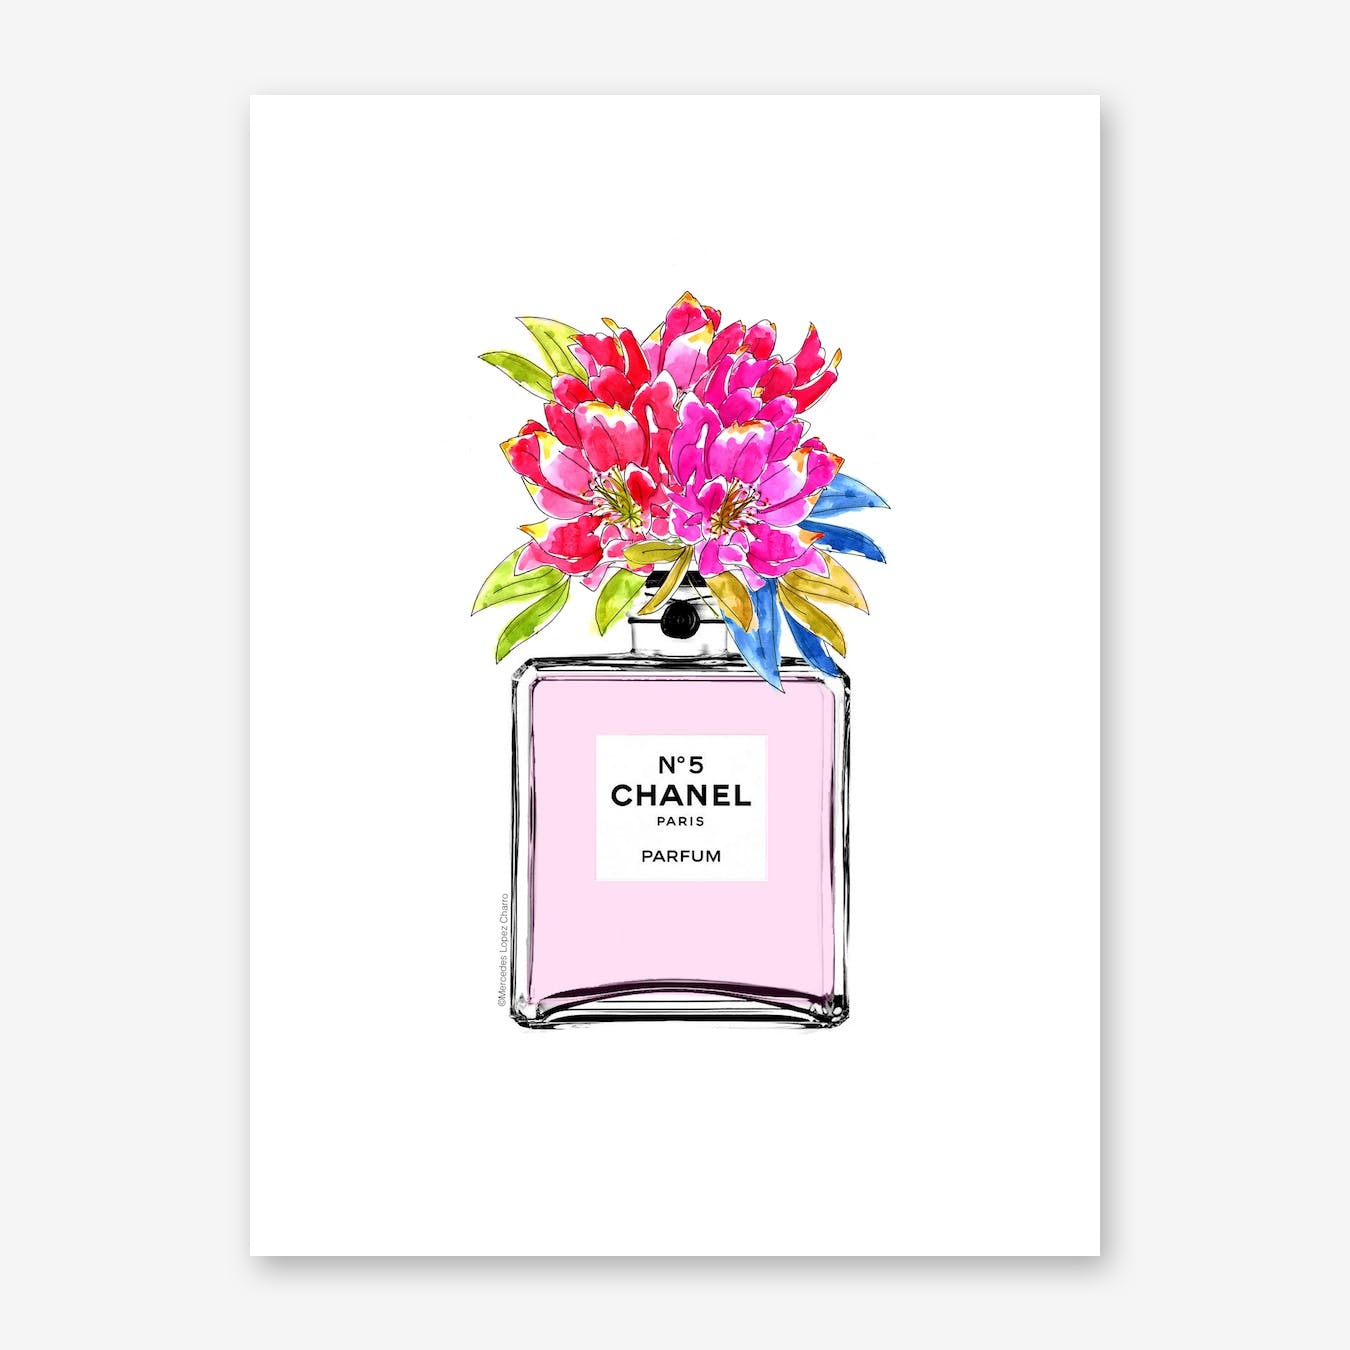 Chanel Pastel